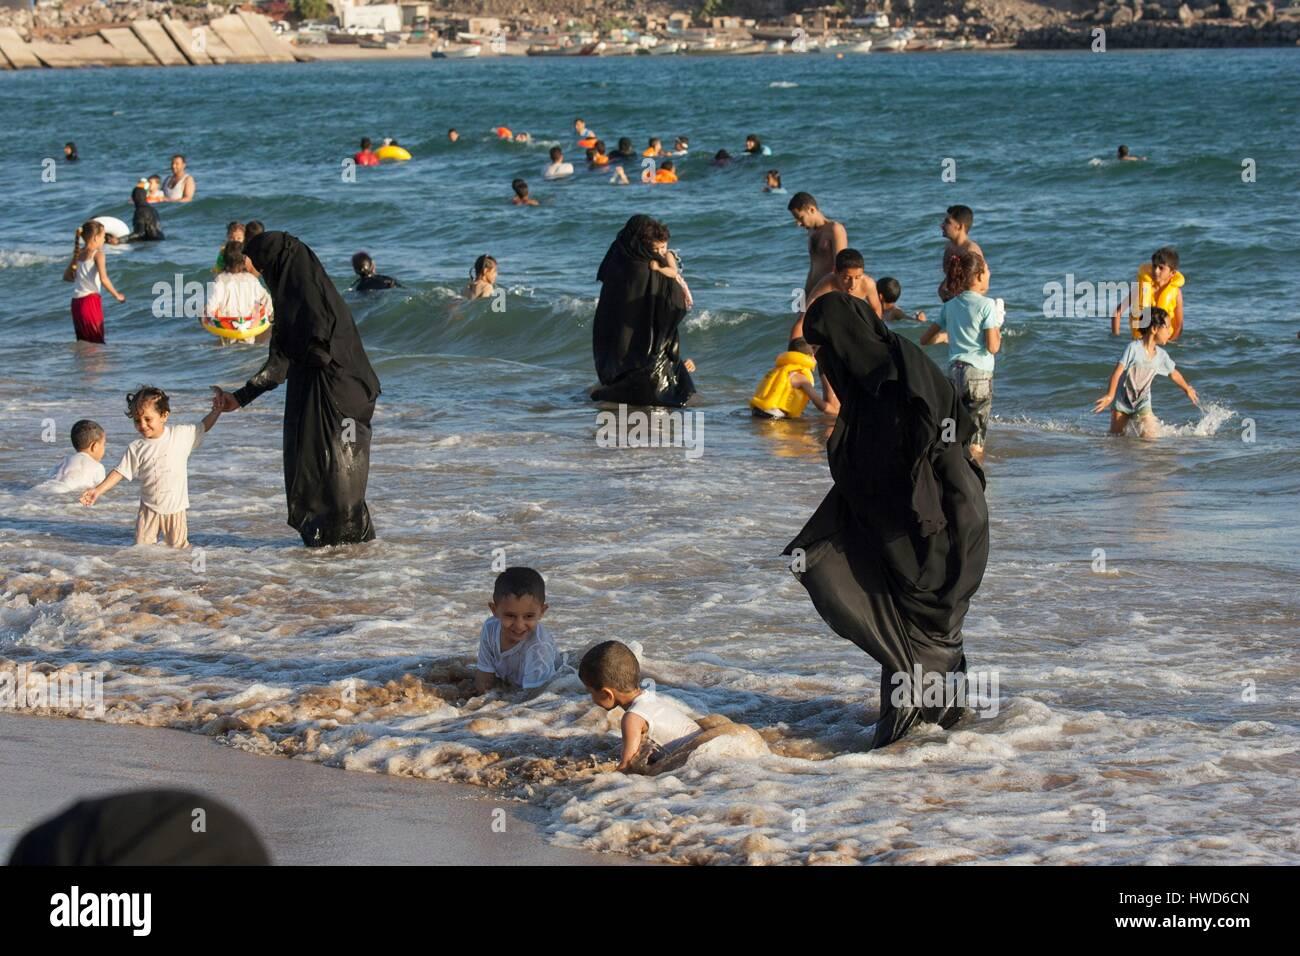 Yemen, Aden, Aid el Kebir, women bathing their children - Stock Image